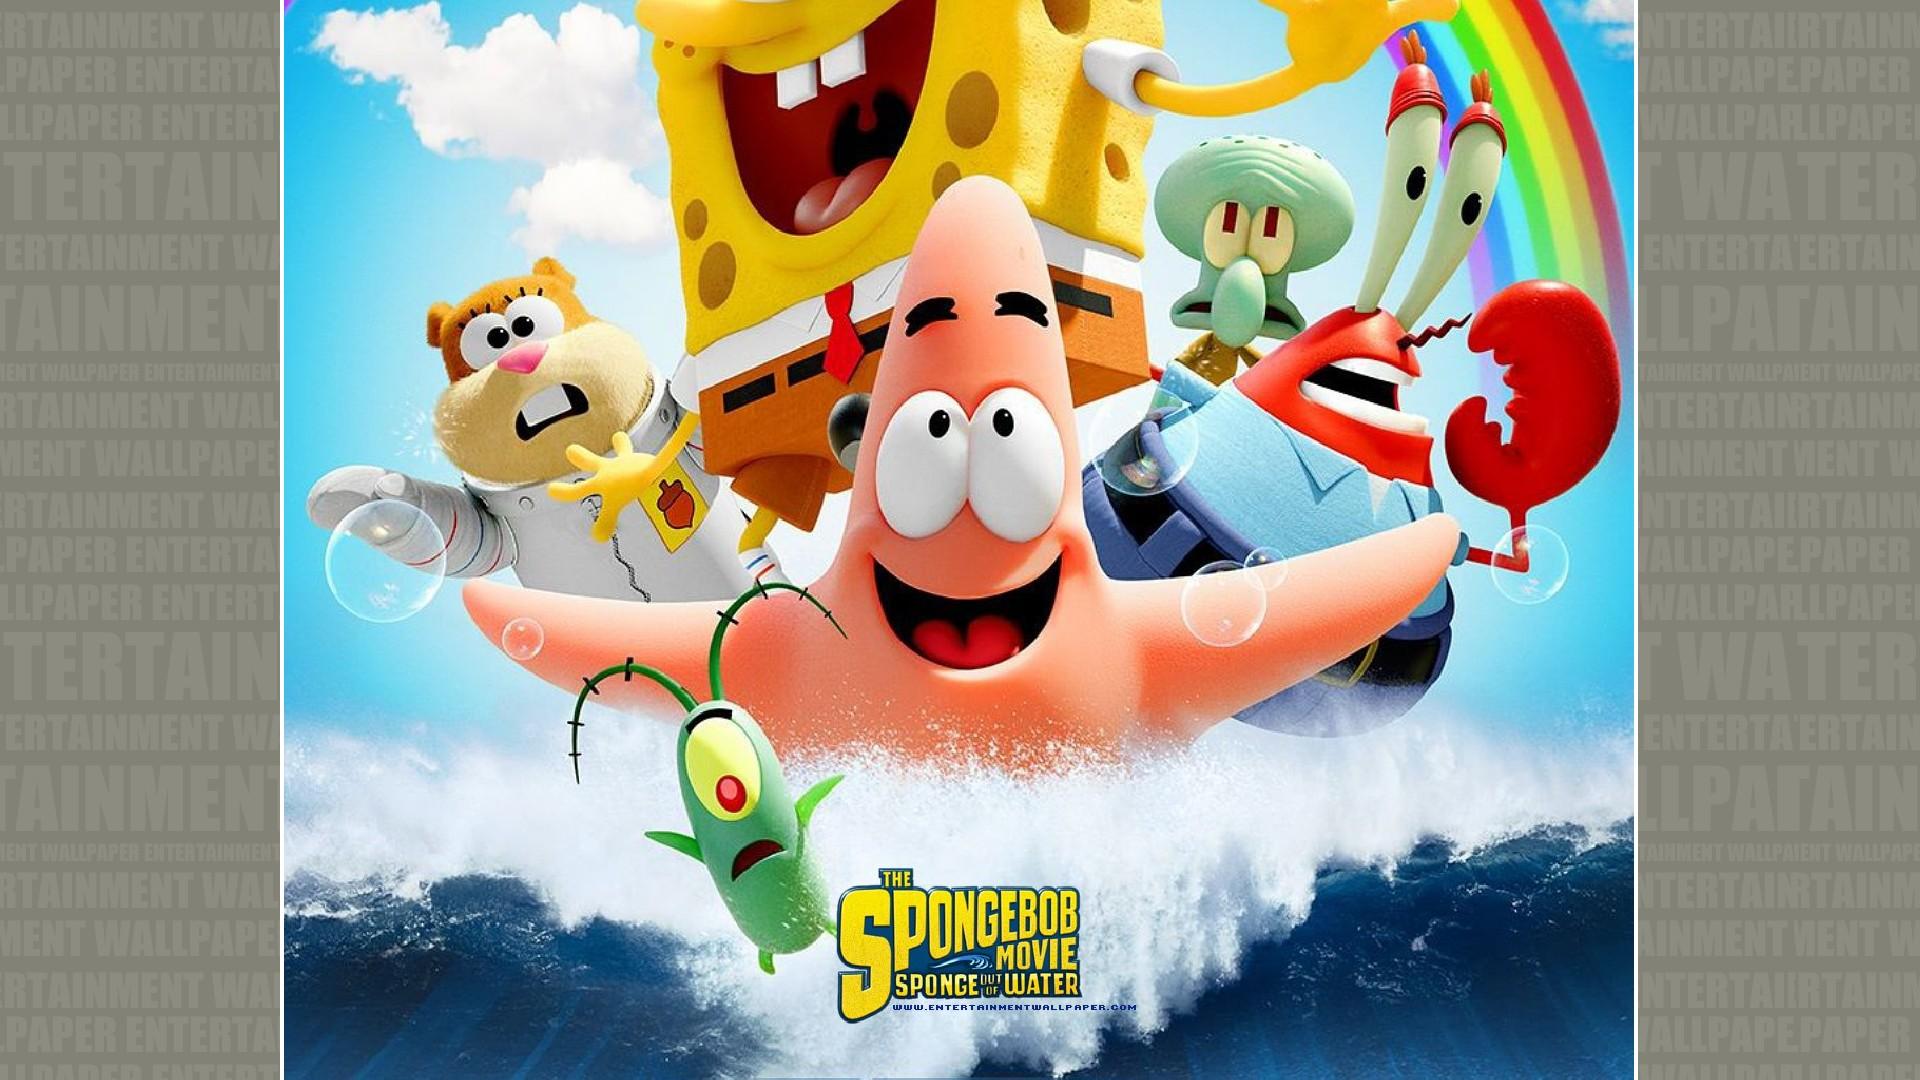 Spongebob Movie Wallpapers Gallery 555786838